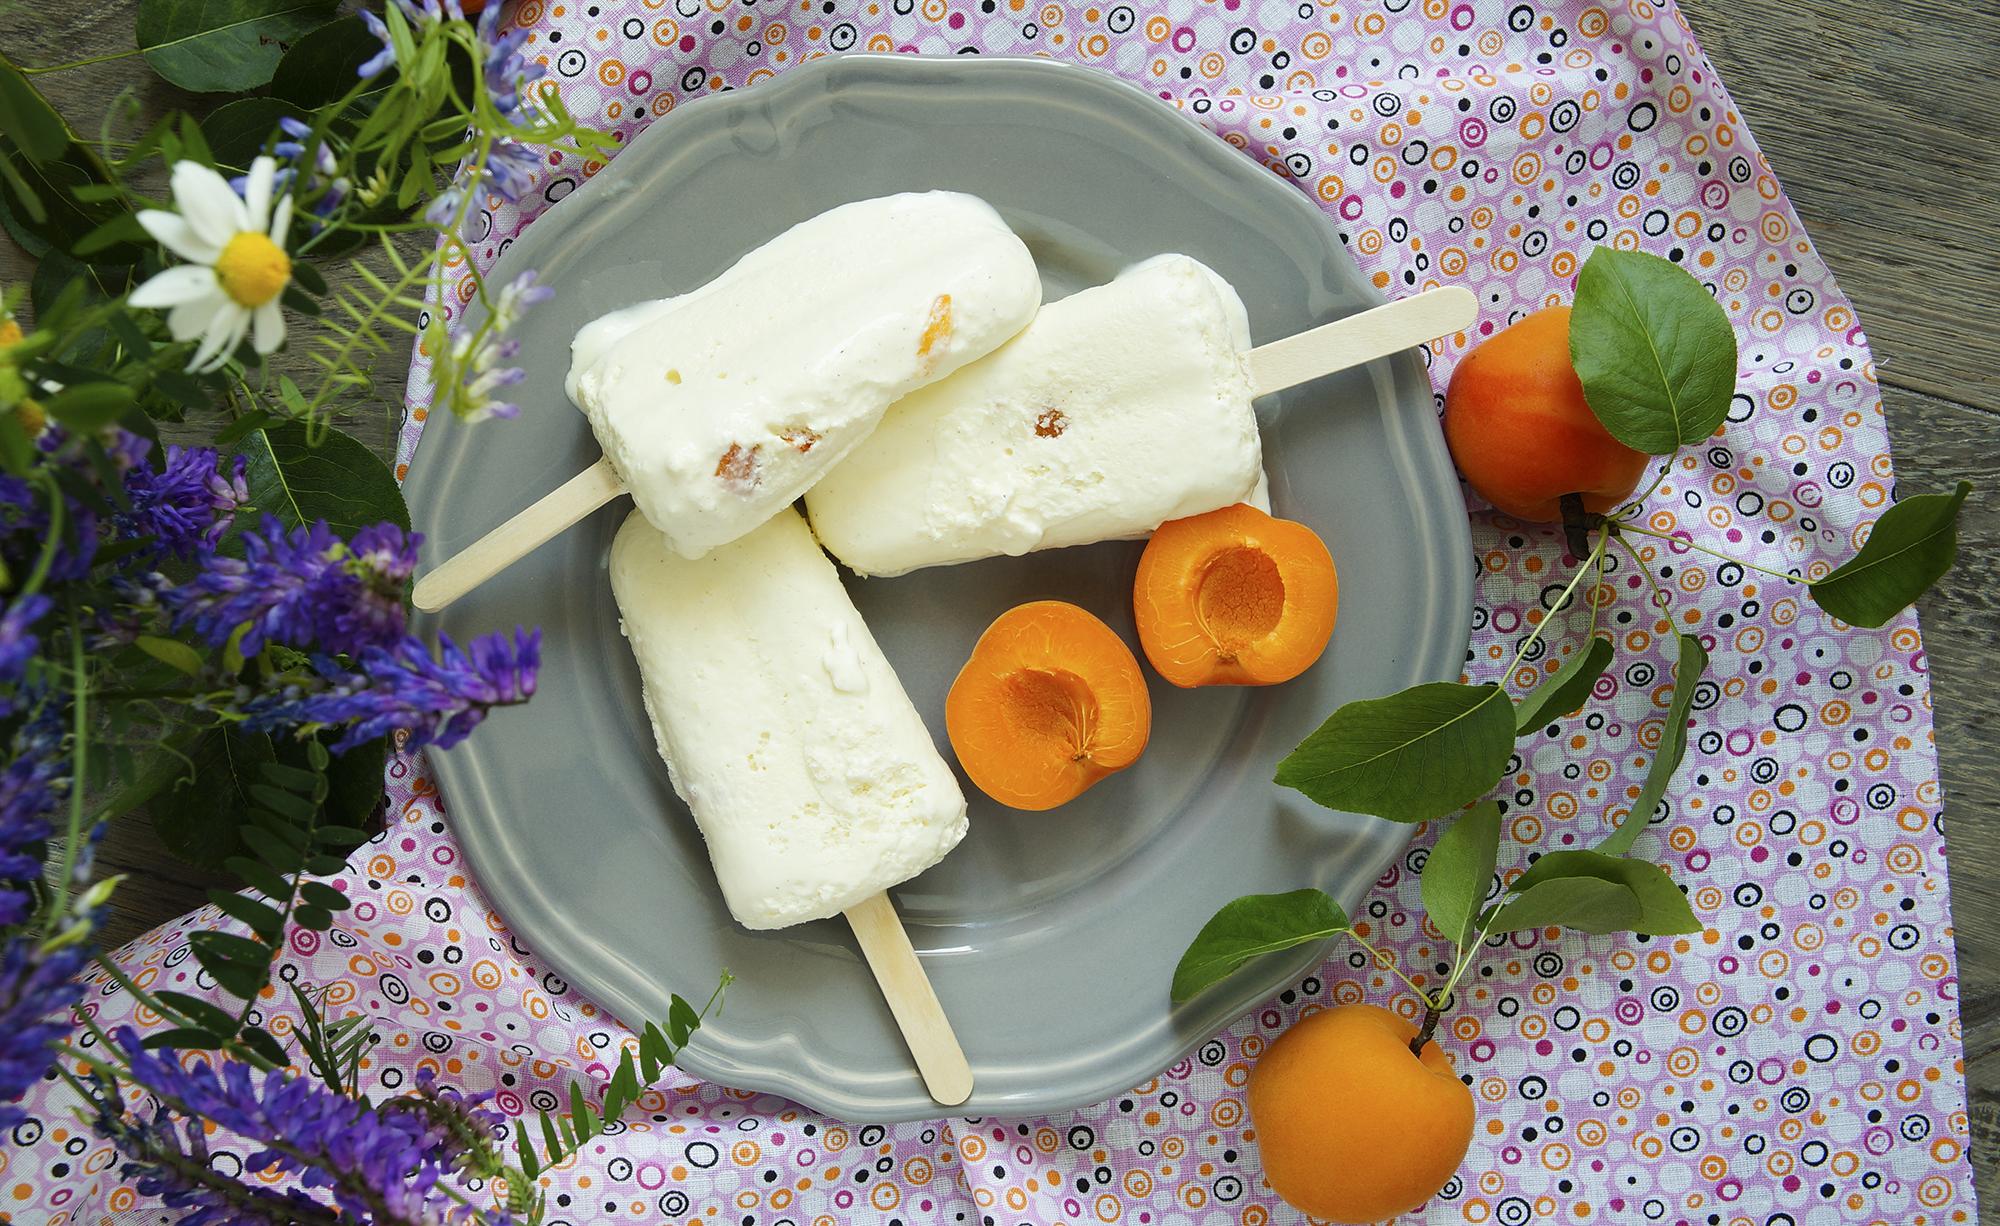 Peaches and cream pops|Peaches and cream pops|pops